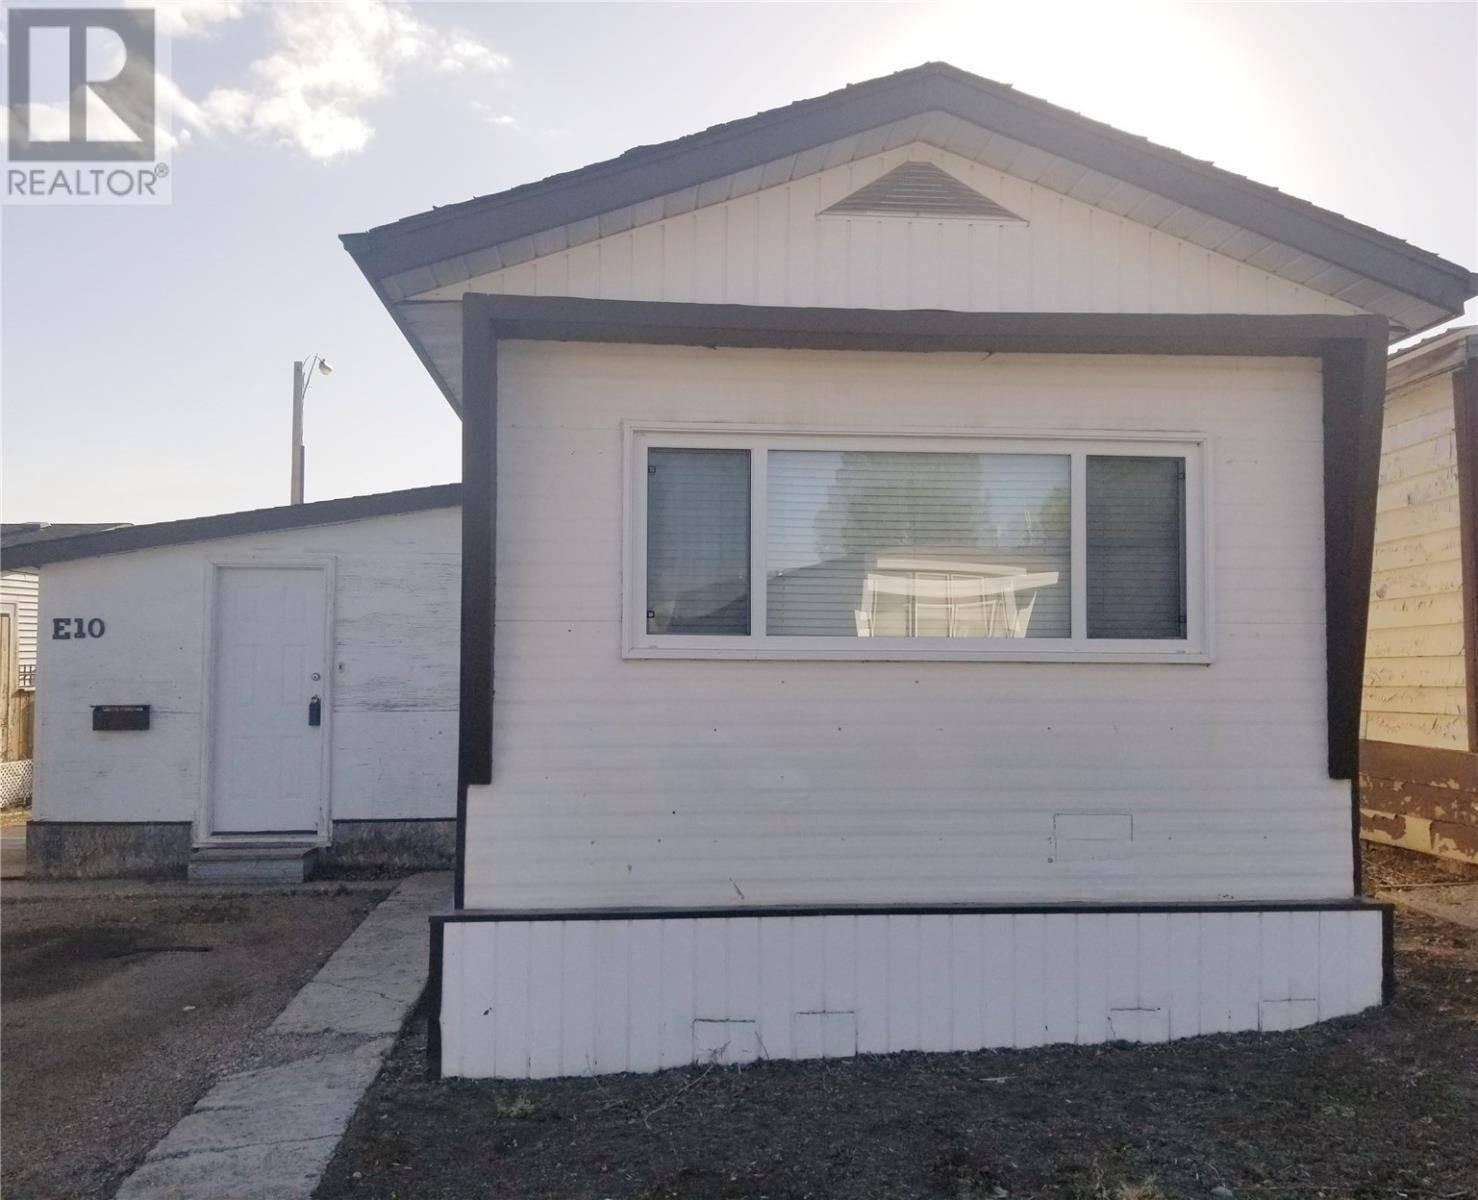 Residential property for sale at 10 E Ave Ne Moose Jaw Saskatchewan - MLS: SK759941